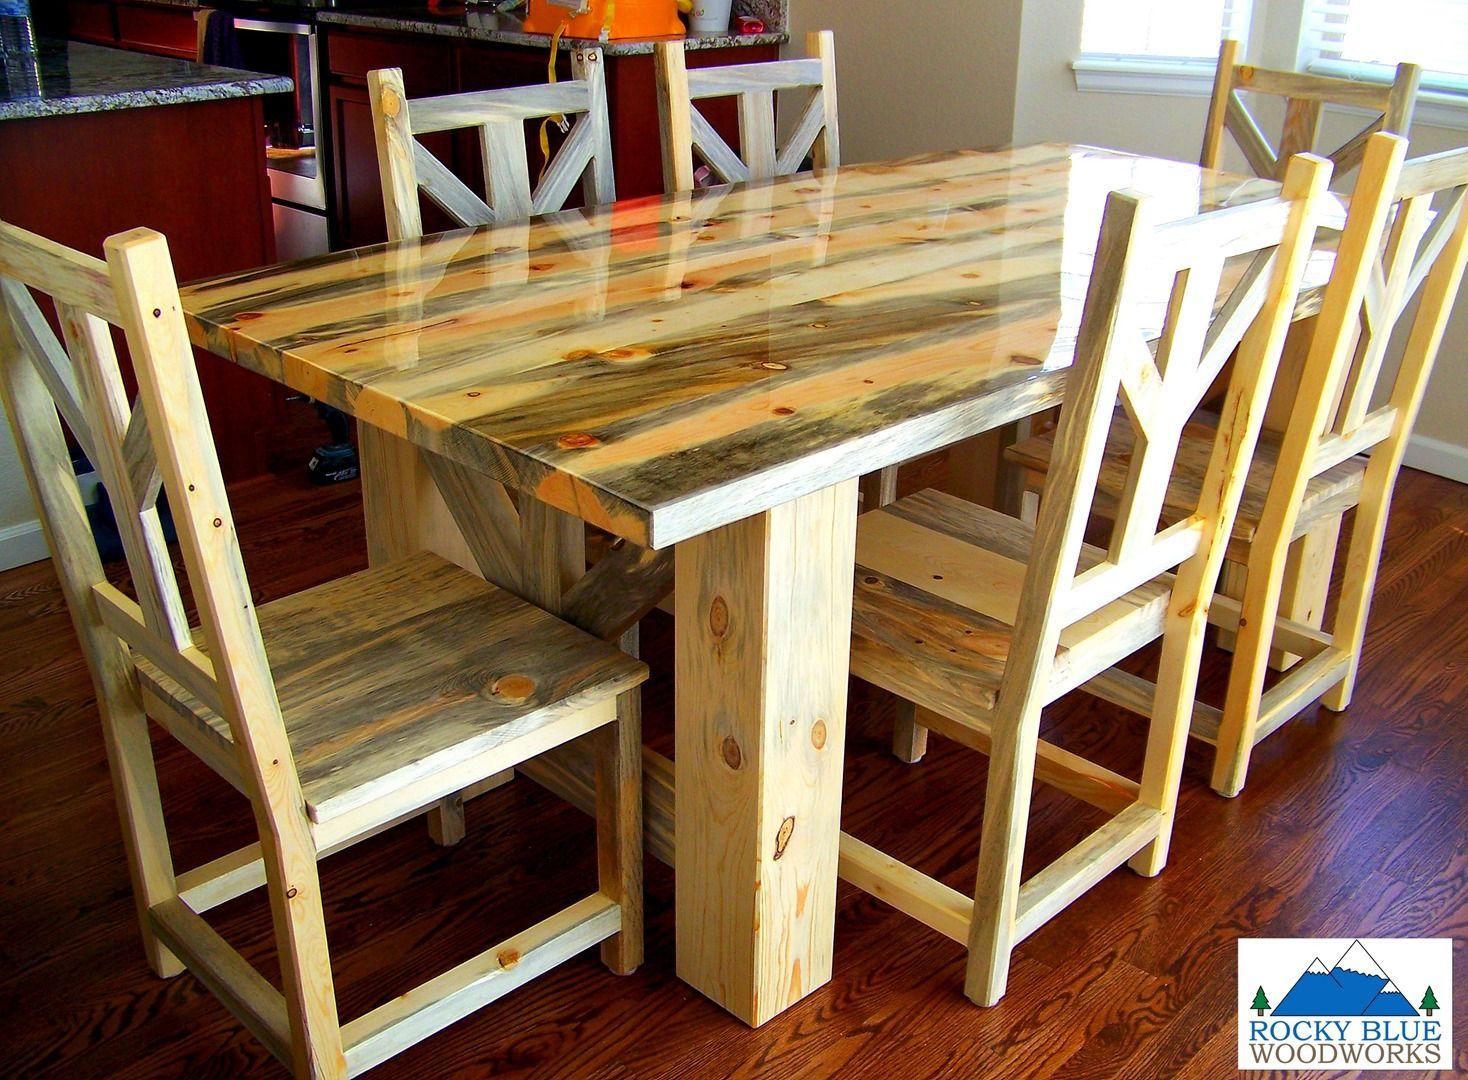 Live Edge Dining Table Colorado Google Search Dining Table Pine Dining Chairs Live Edge Dining Table